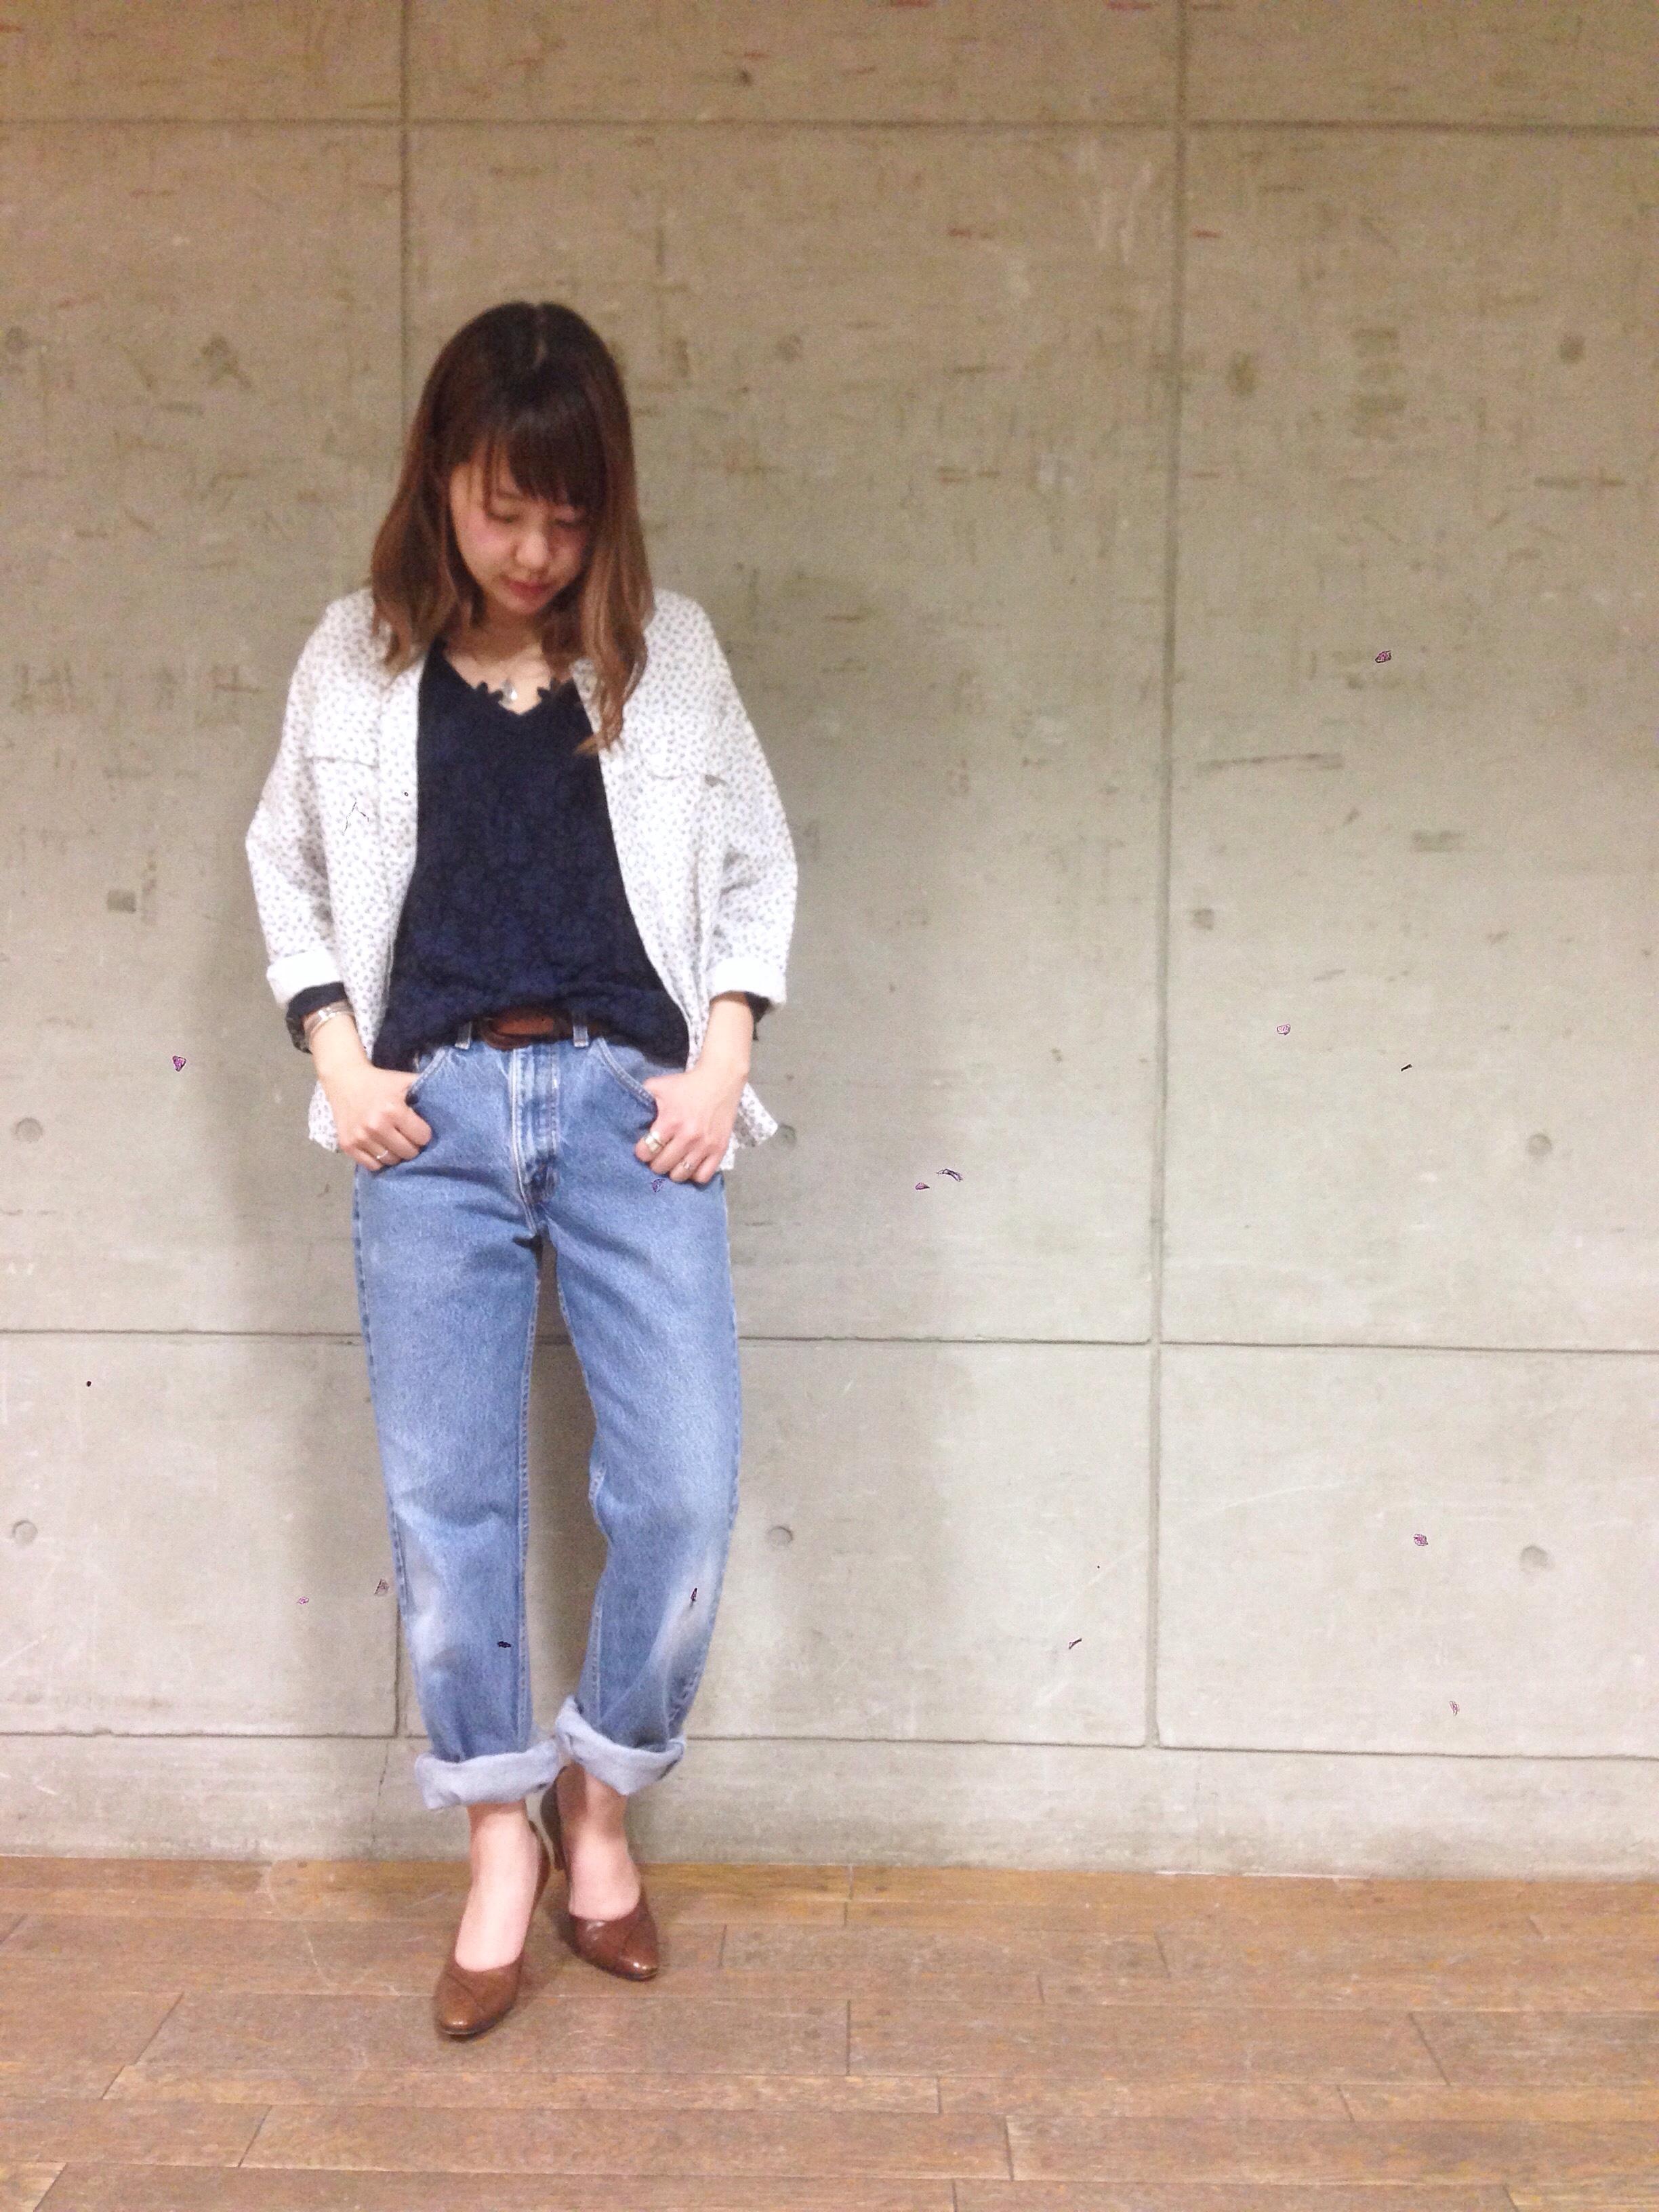 fc2blog_20170427172755f17.jpg